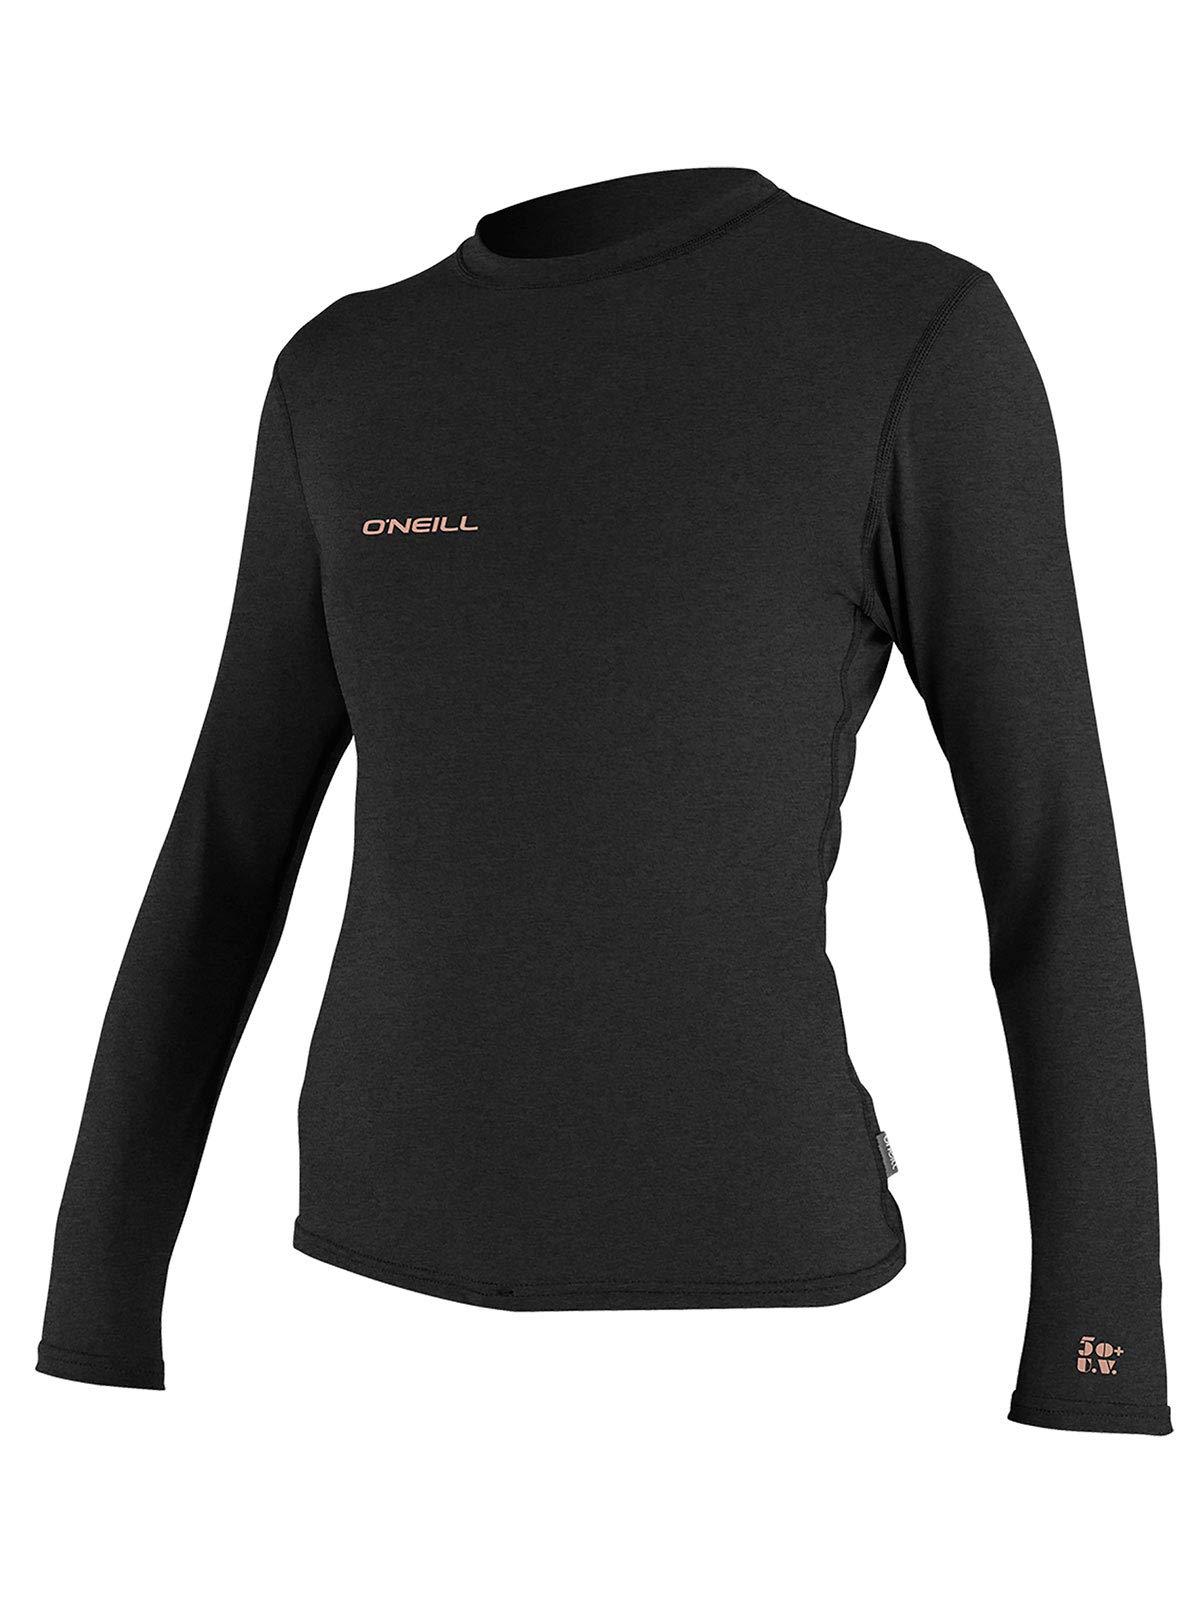 O'Neill Wetsuits Women's Hybrid UPF 50+ Long Sleeve Sun Shirt, Black, X-Small